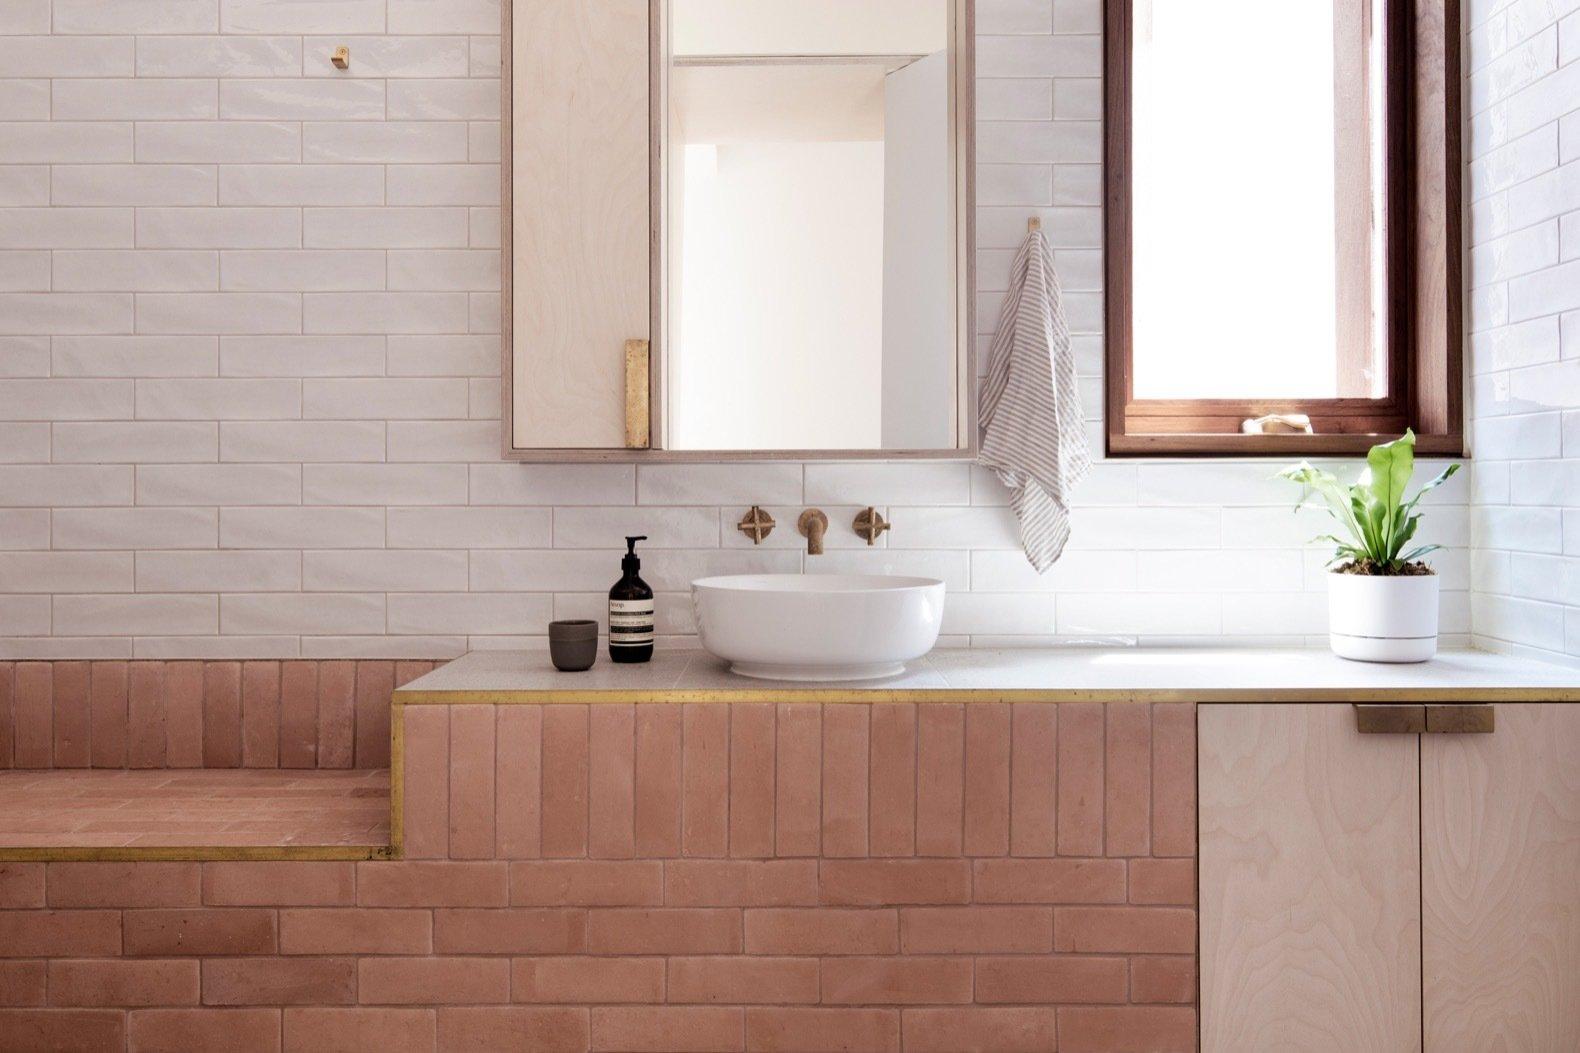 Three Piece House brick bathroom vanity